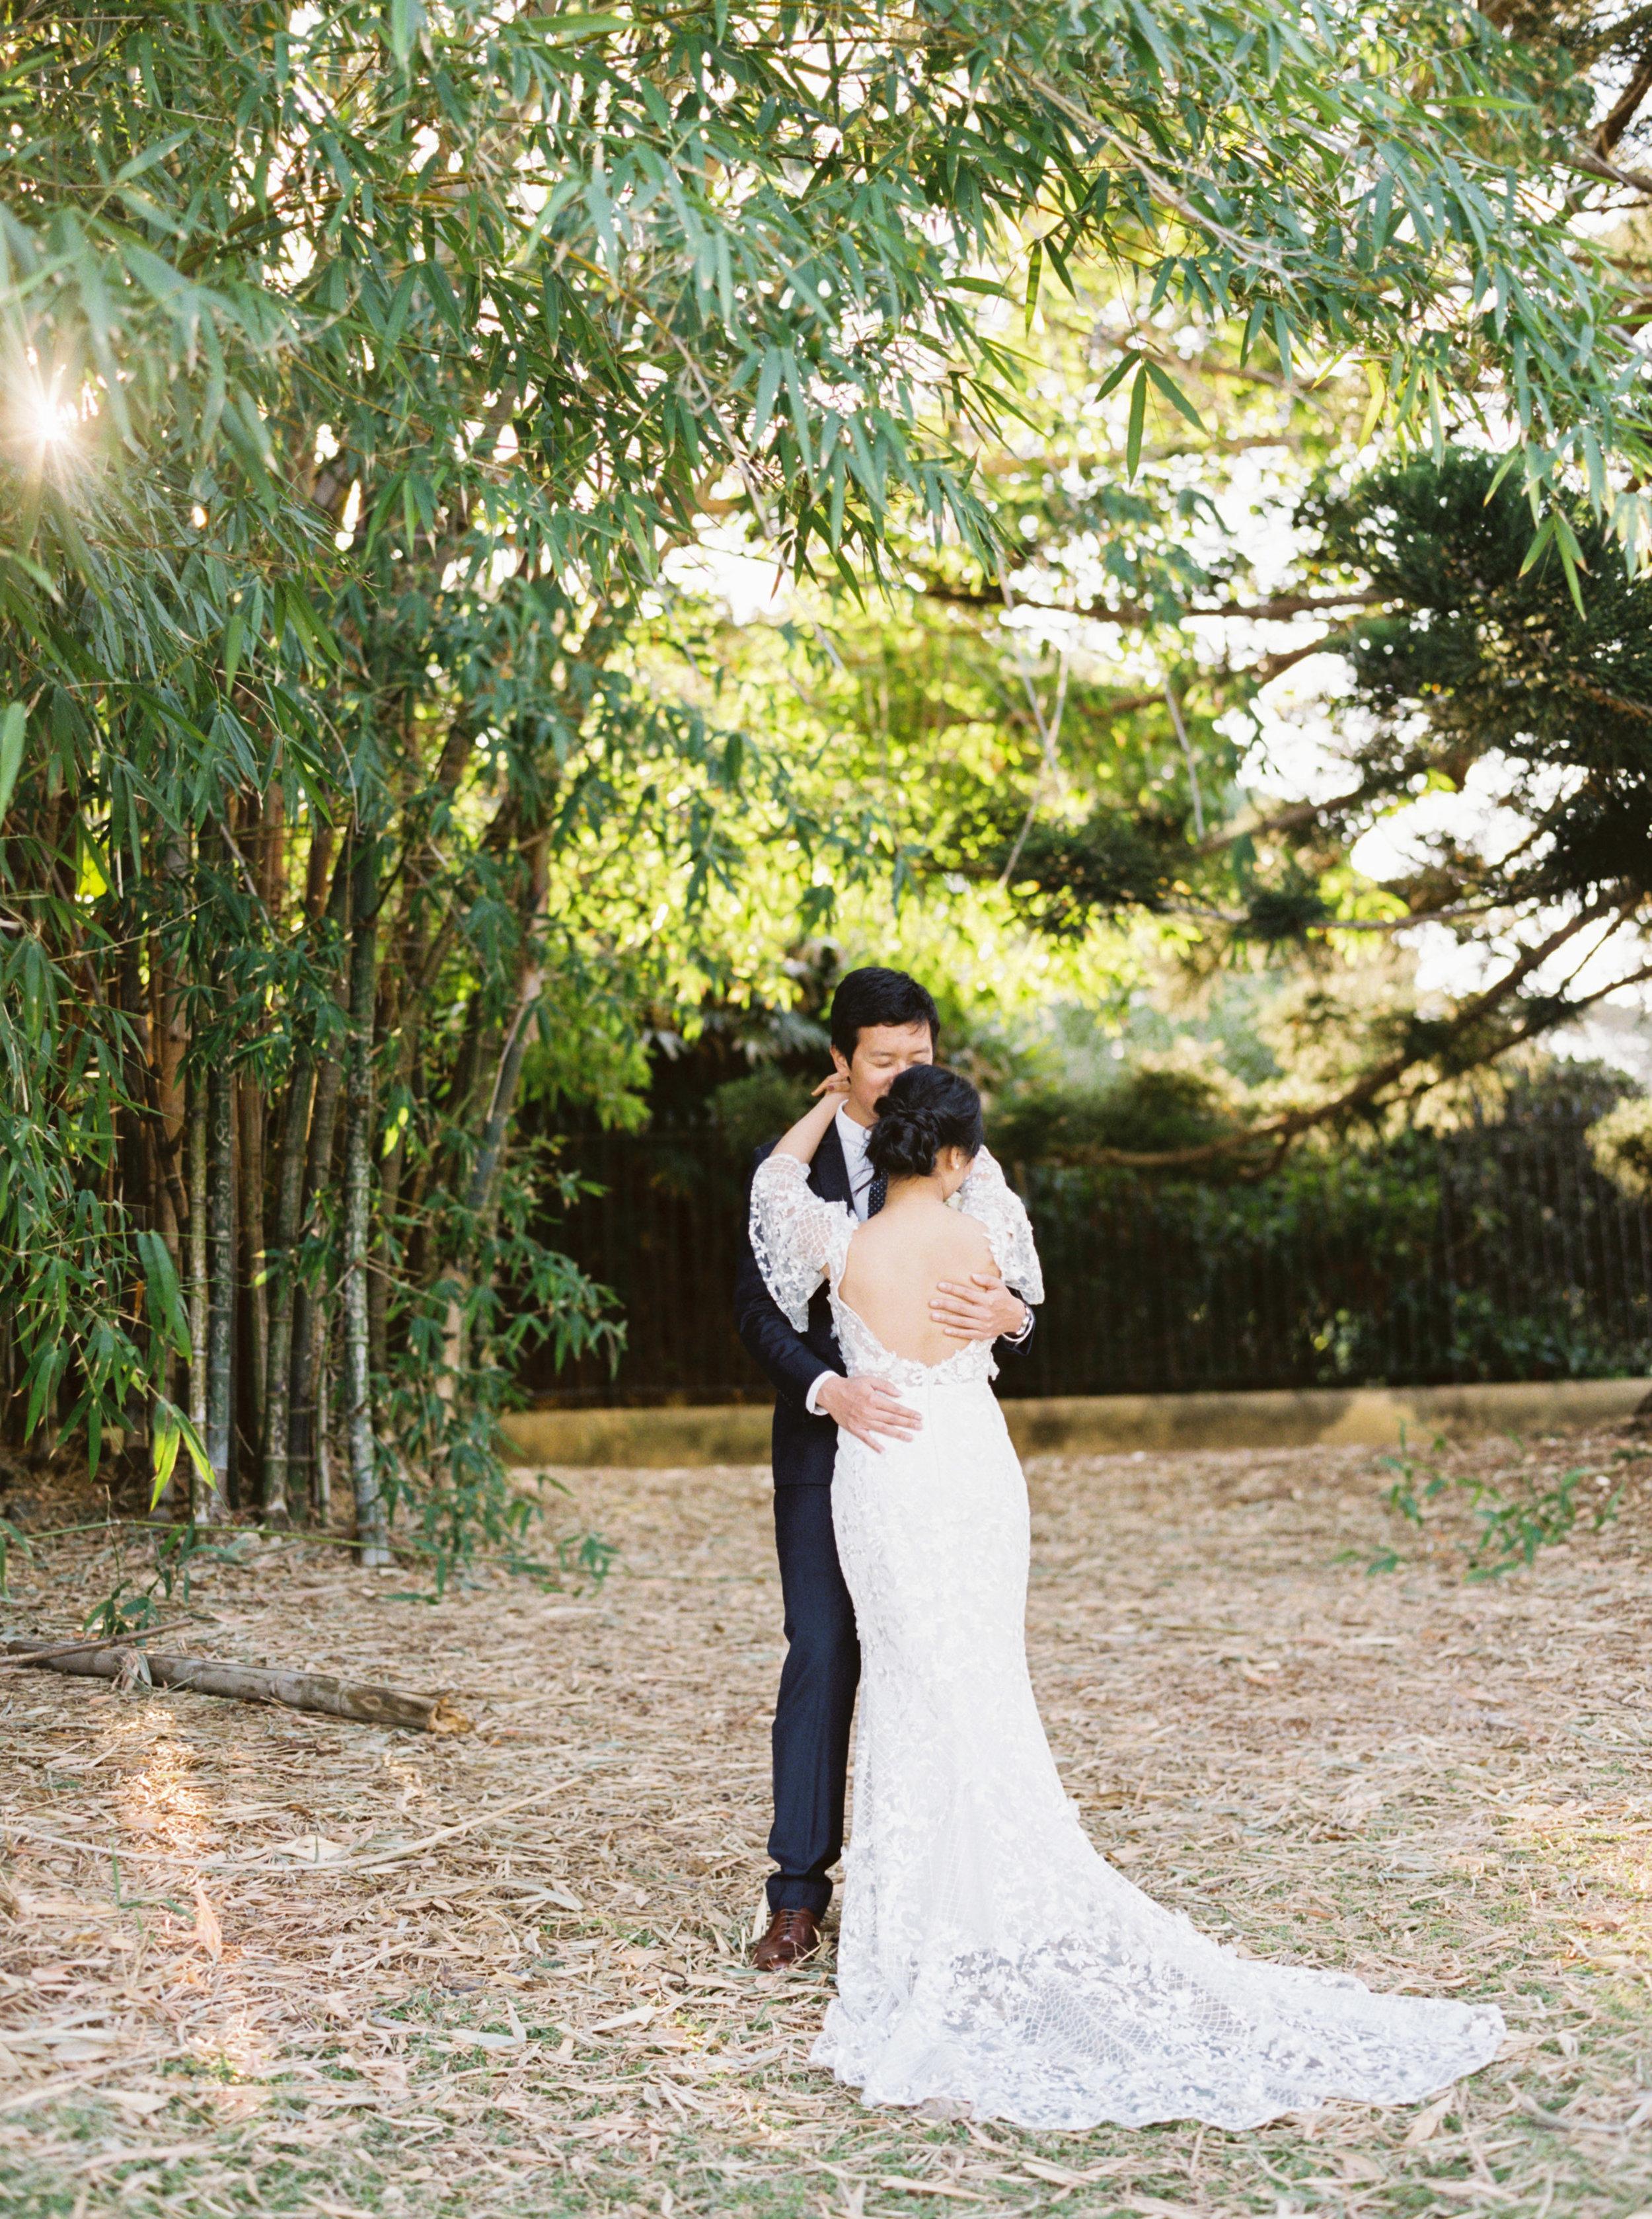 00032- Australia Sydney Wedding Photographer Sheri McMahon.jpg